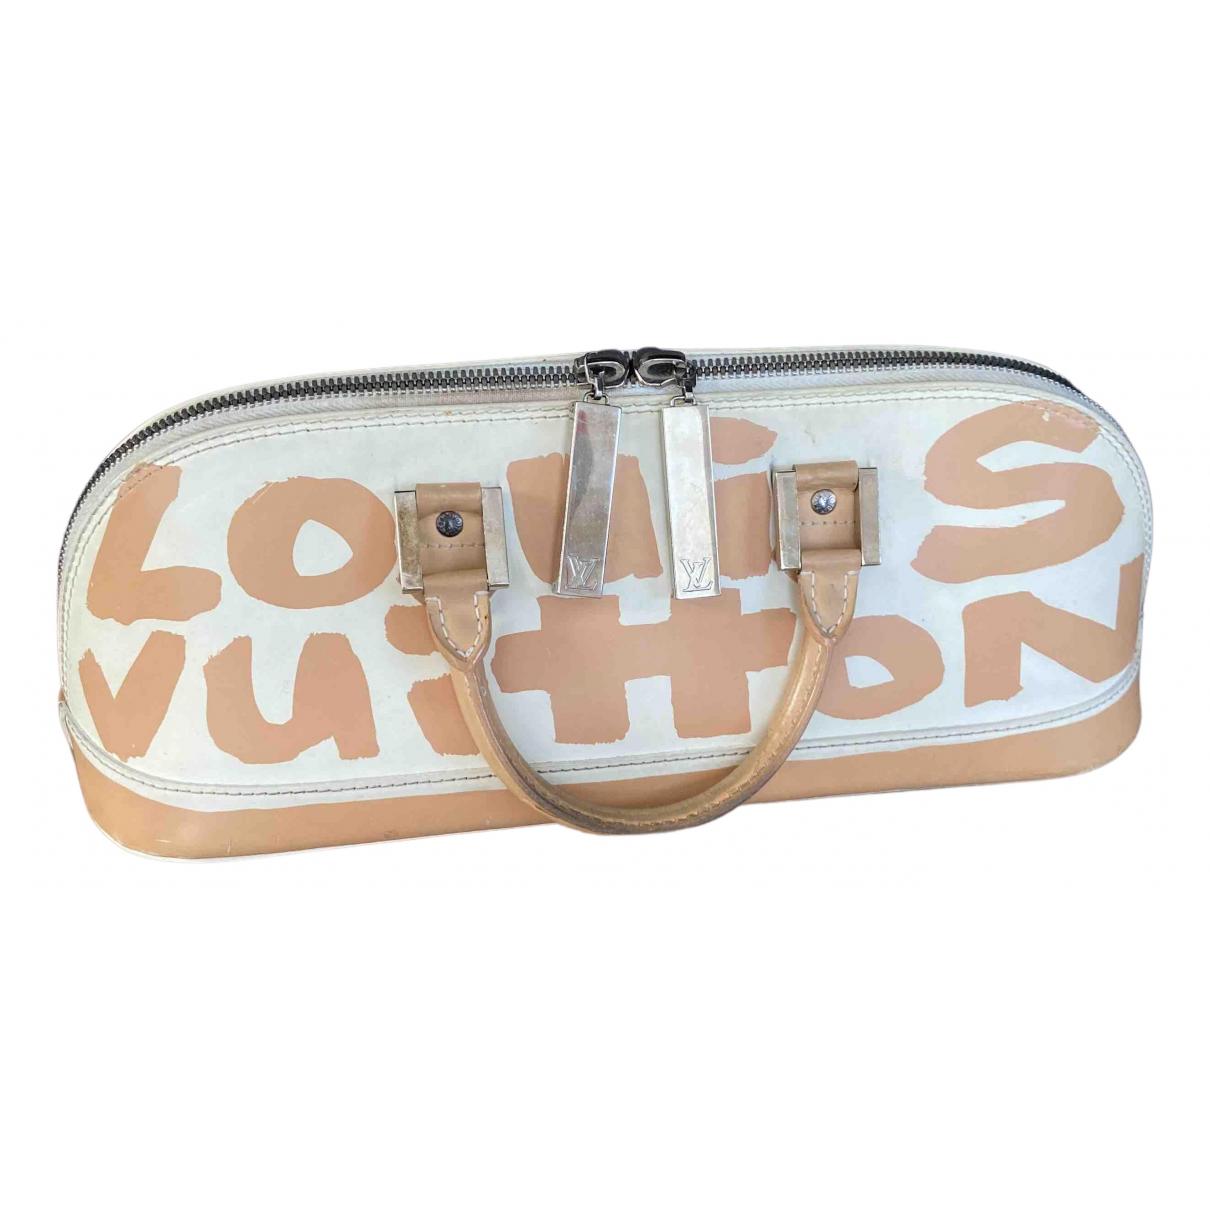 Louis Vuitton - Sac a main Alma pour femme en toile